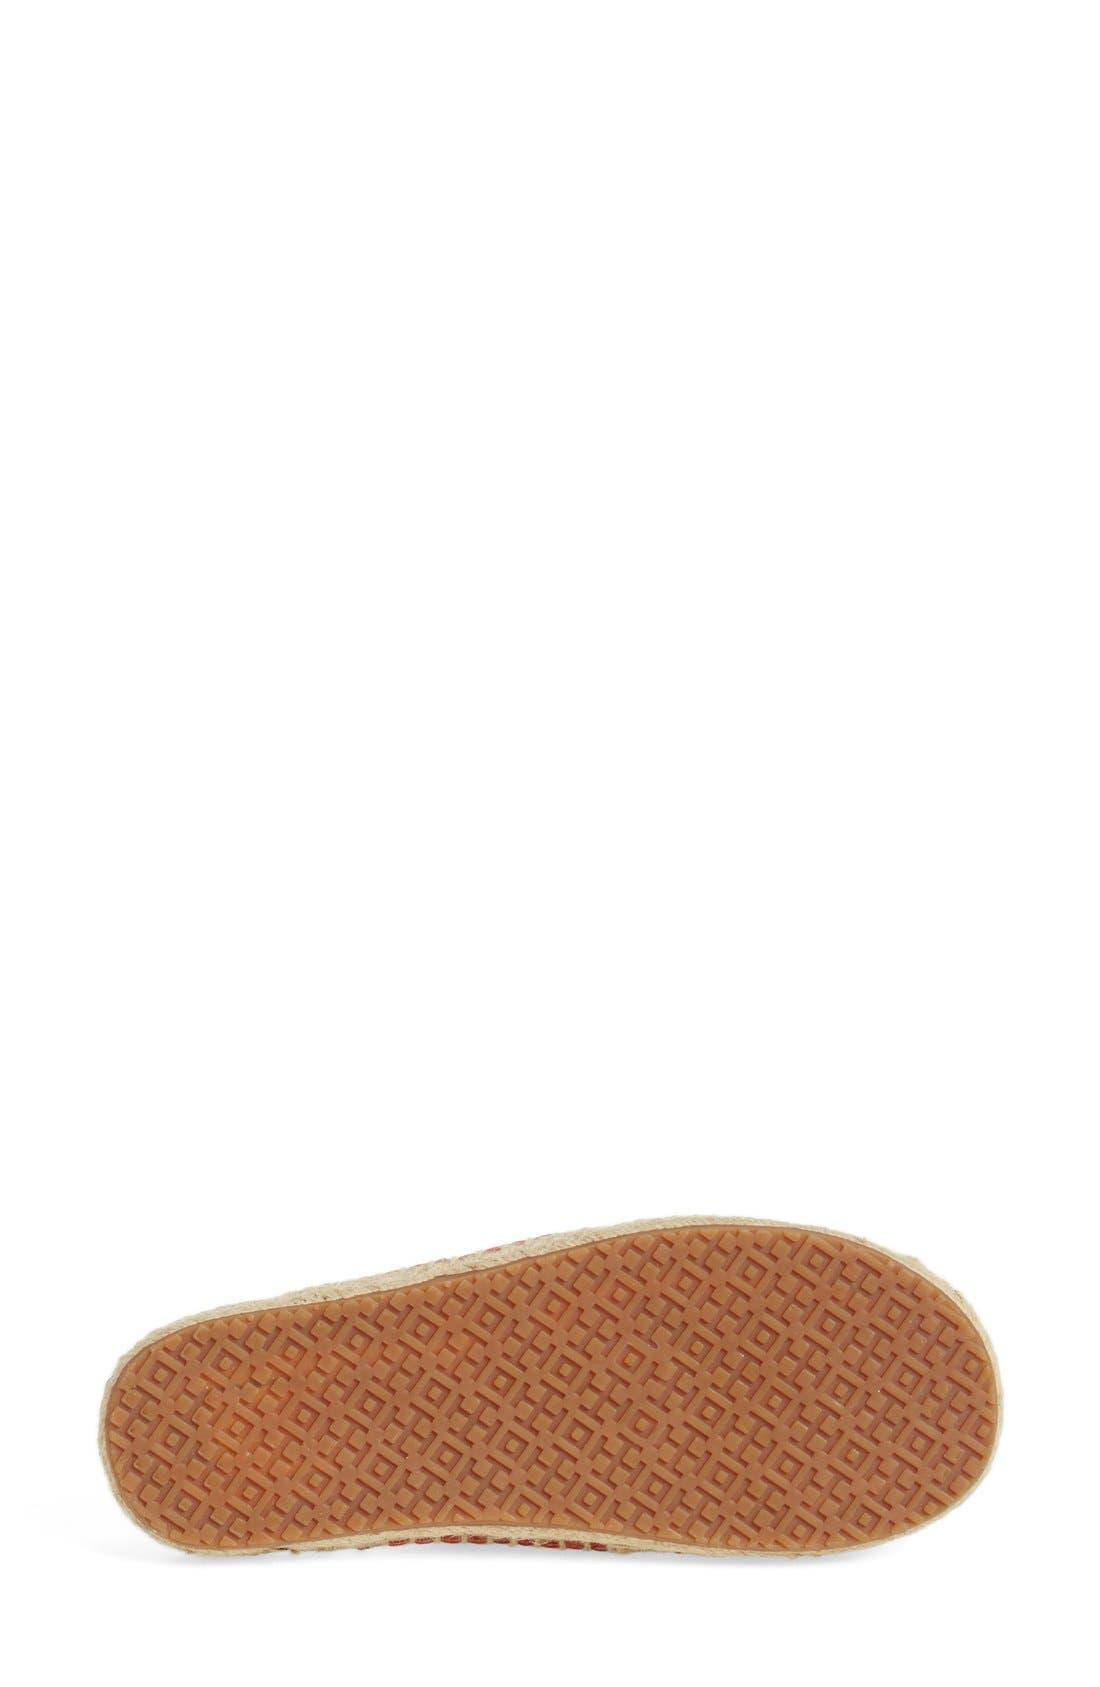 TORY BURCH,                             'Bima' Espadrille Slide Sandal,                             Alternate thumbnail 3, color,                             601